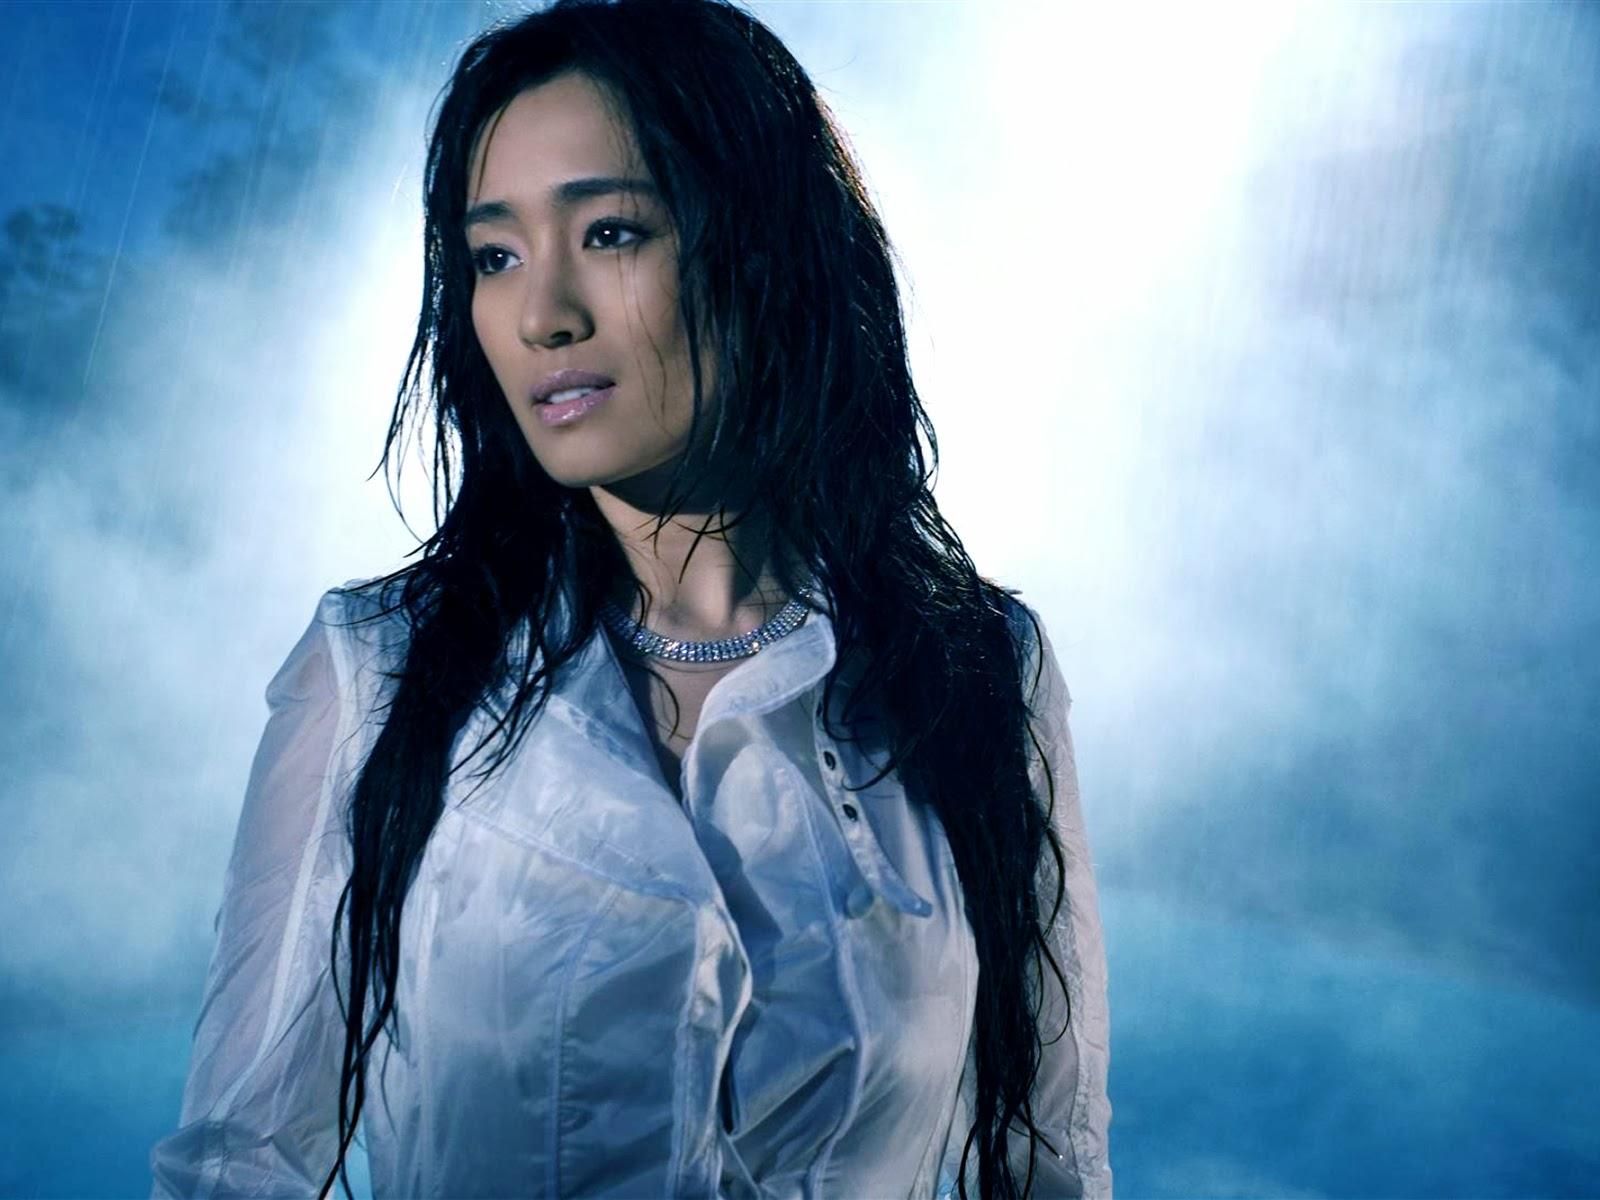 Wallpapers World Amazing: Gong Li - Photos Hot